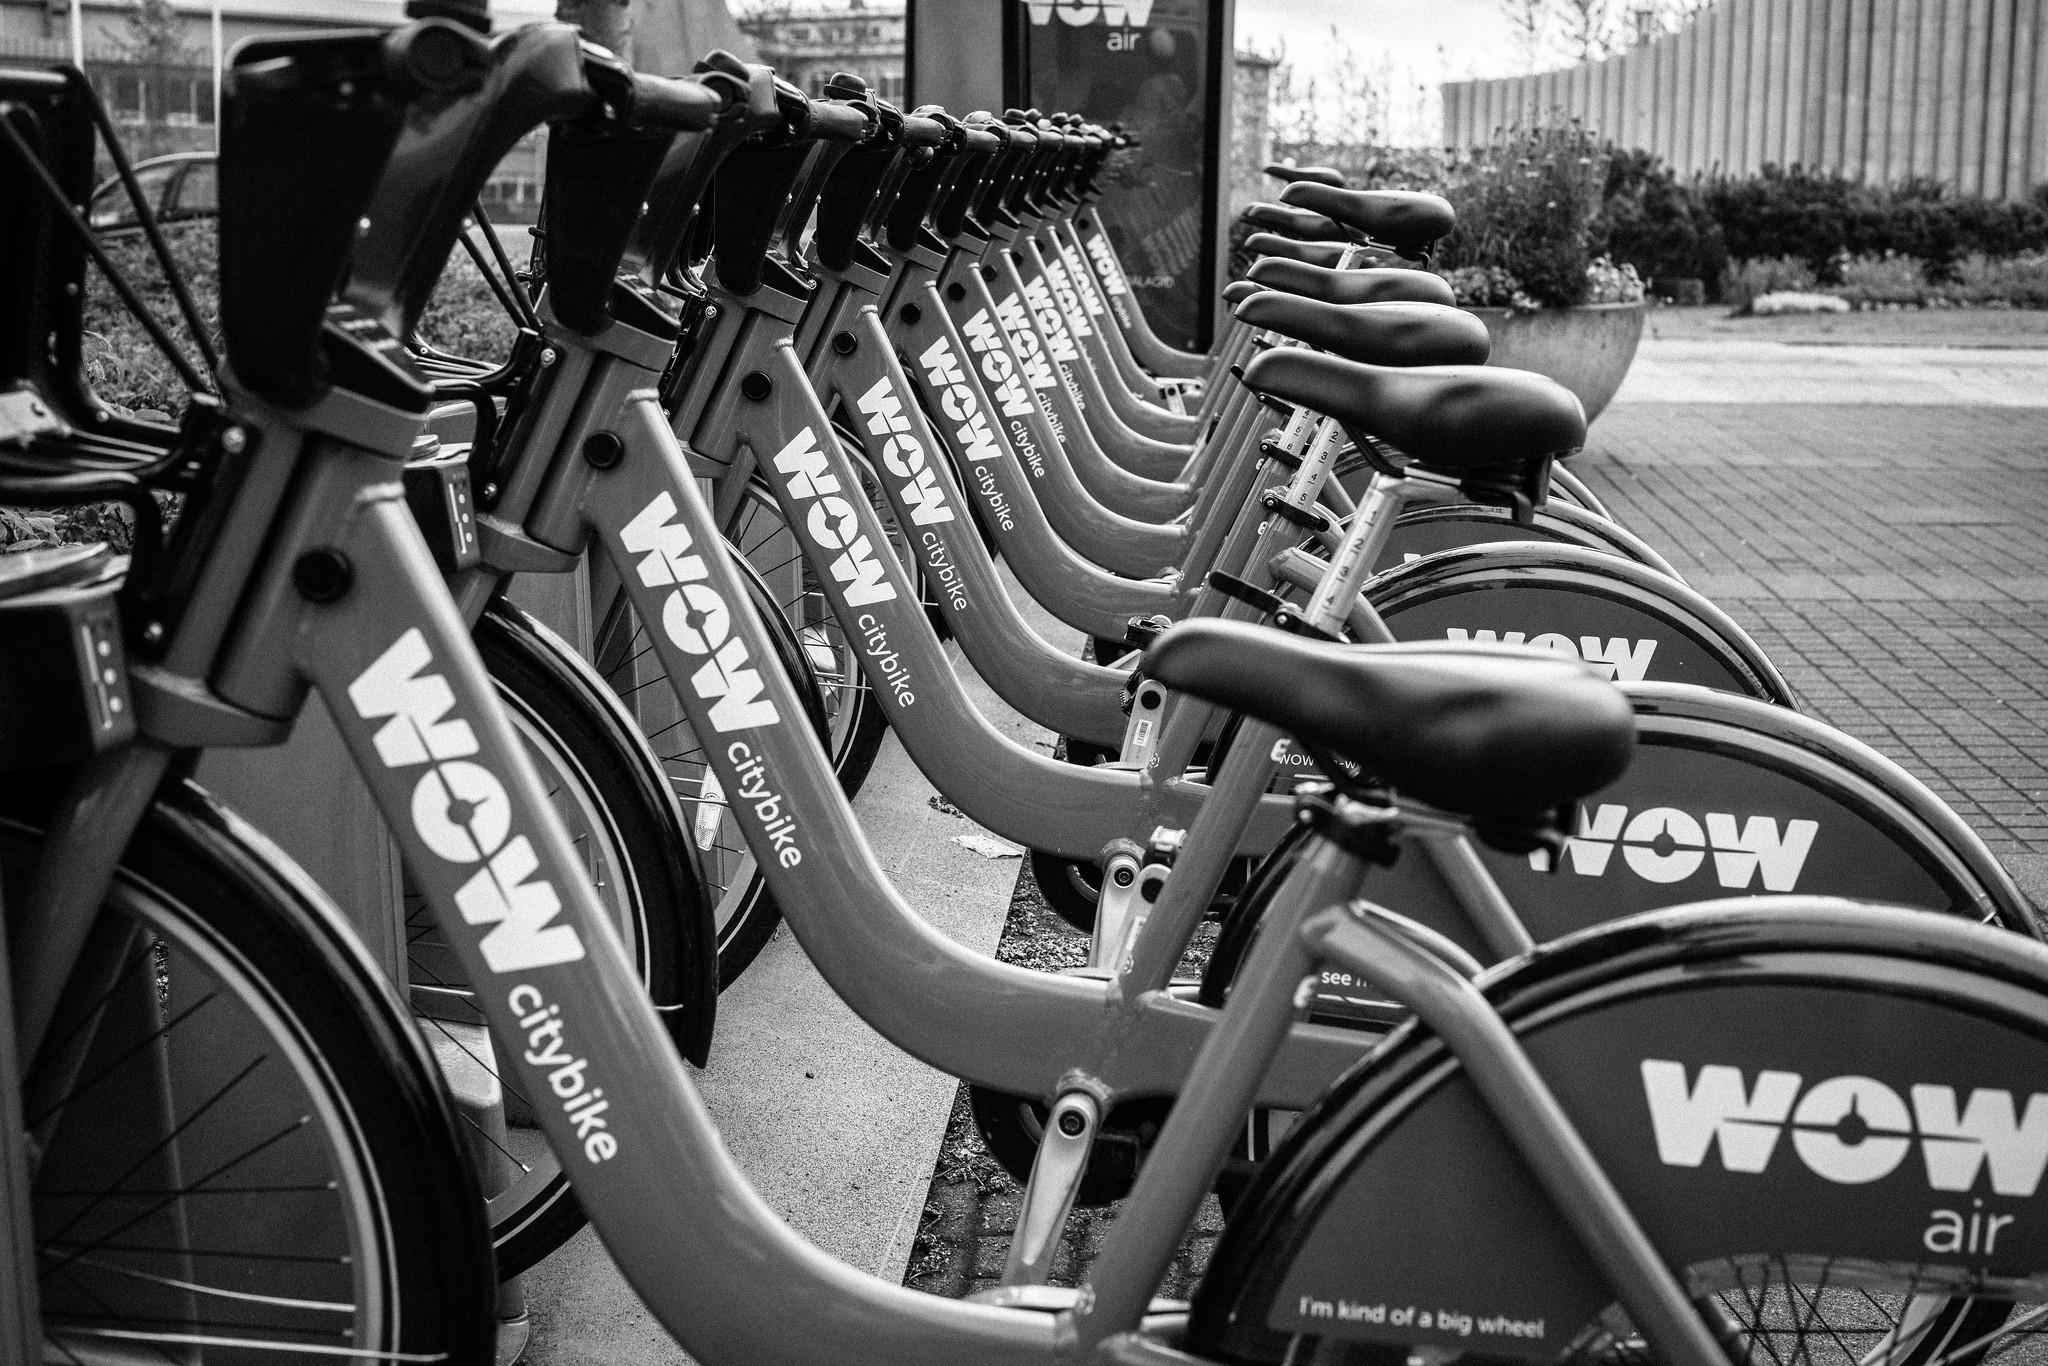 wow bikes